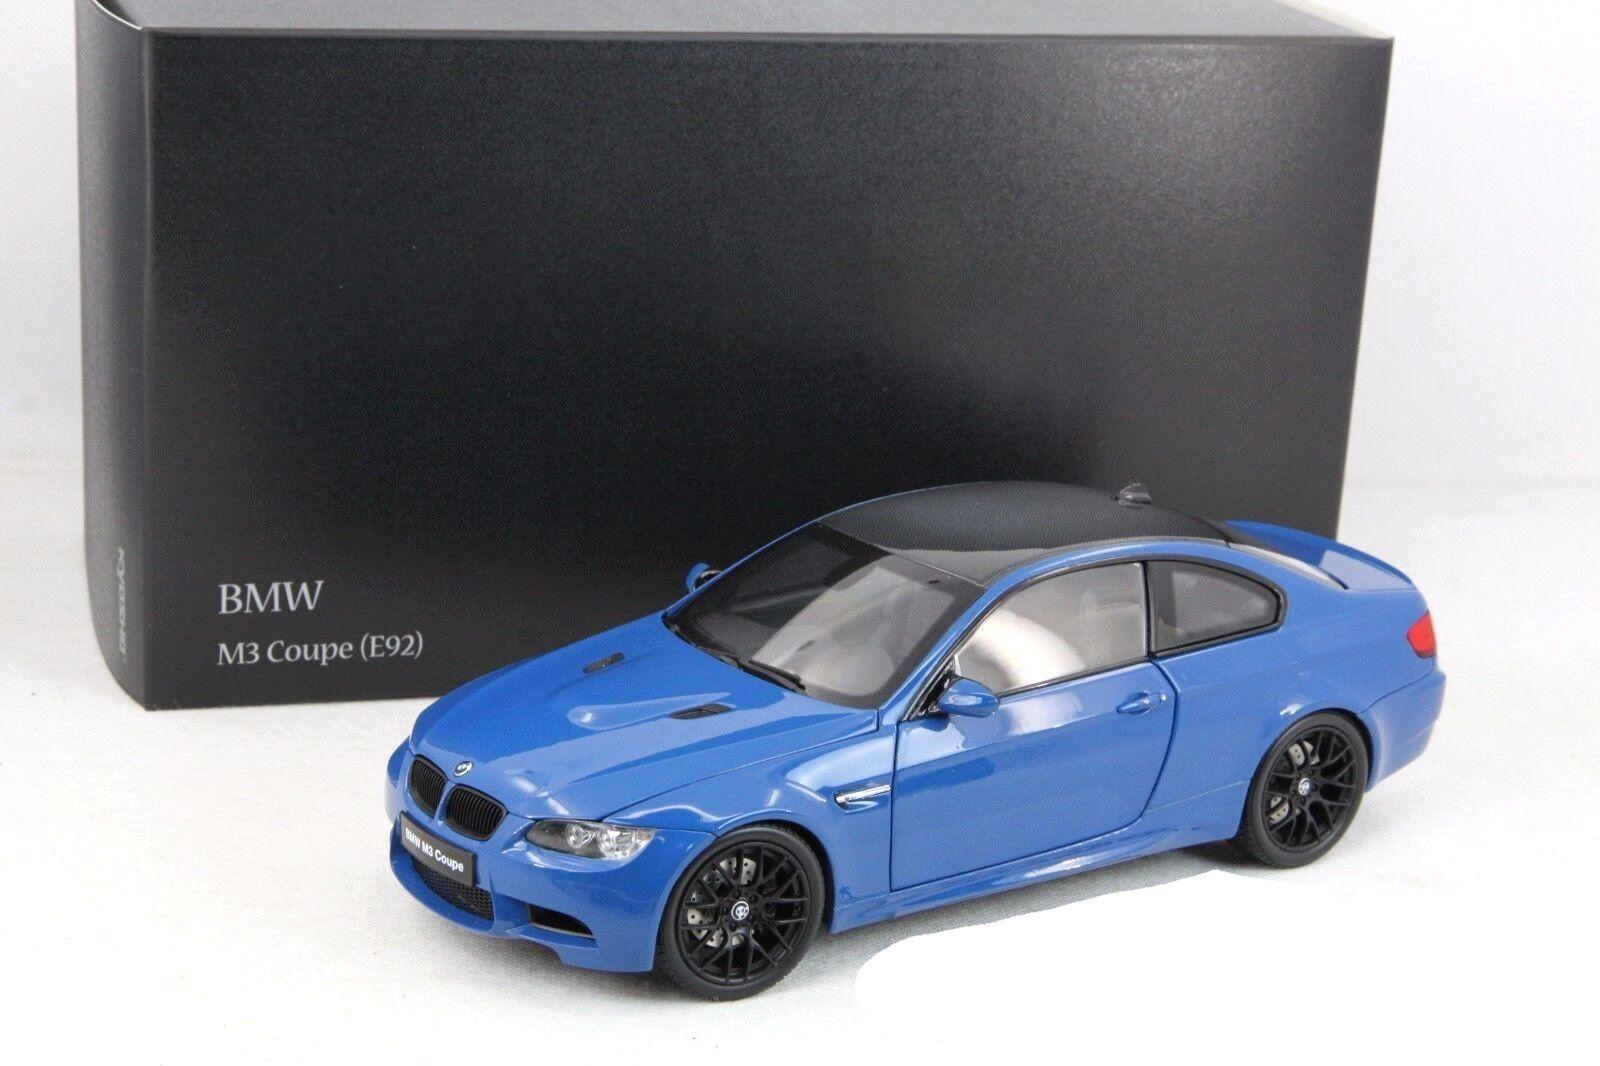 Bmw m3 coupé (e92m kyosho 1,18) nein 08734lbl auto - modell